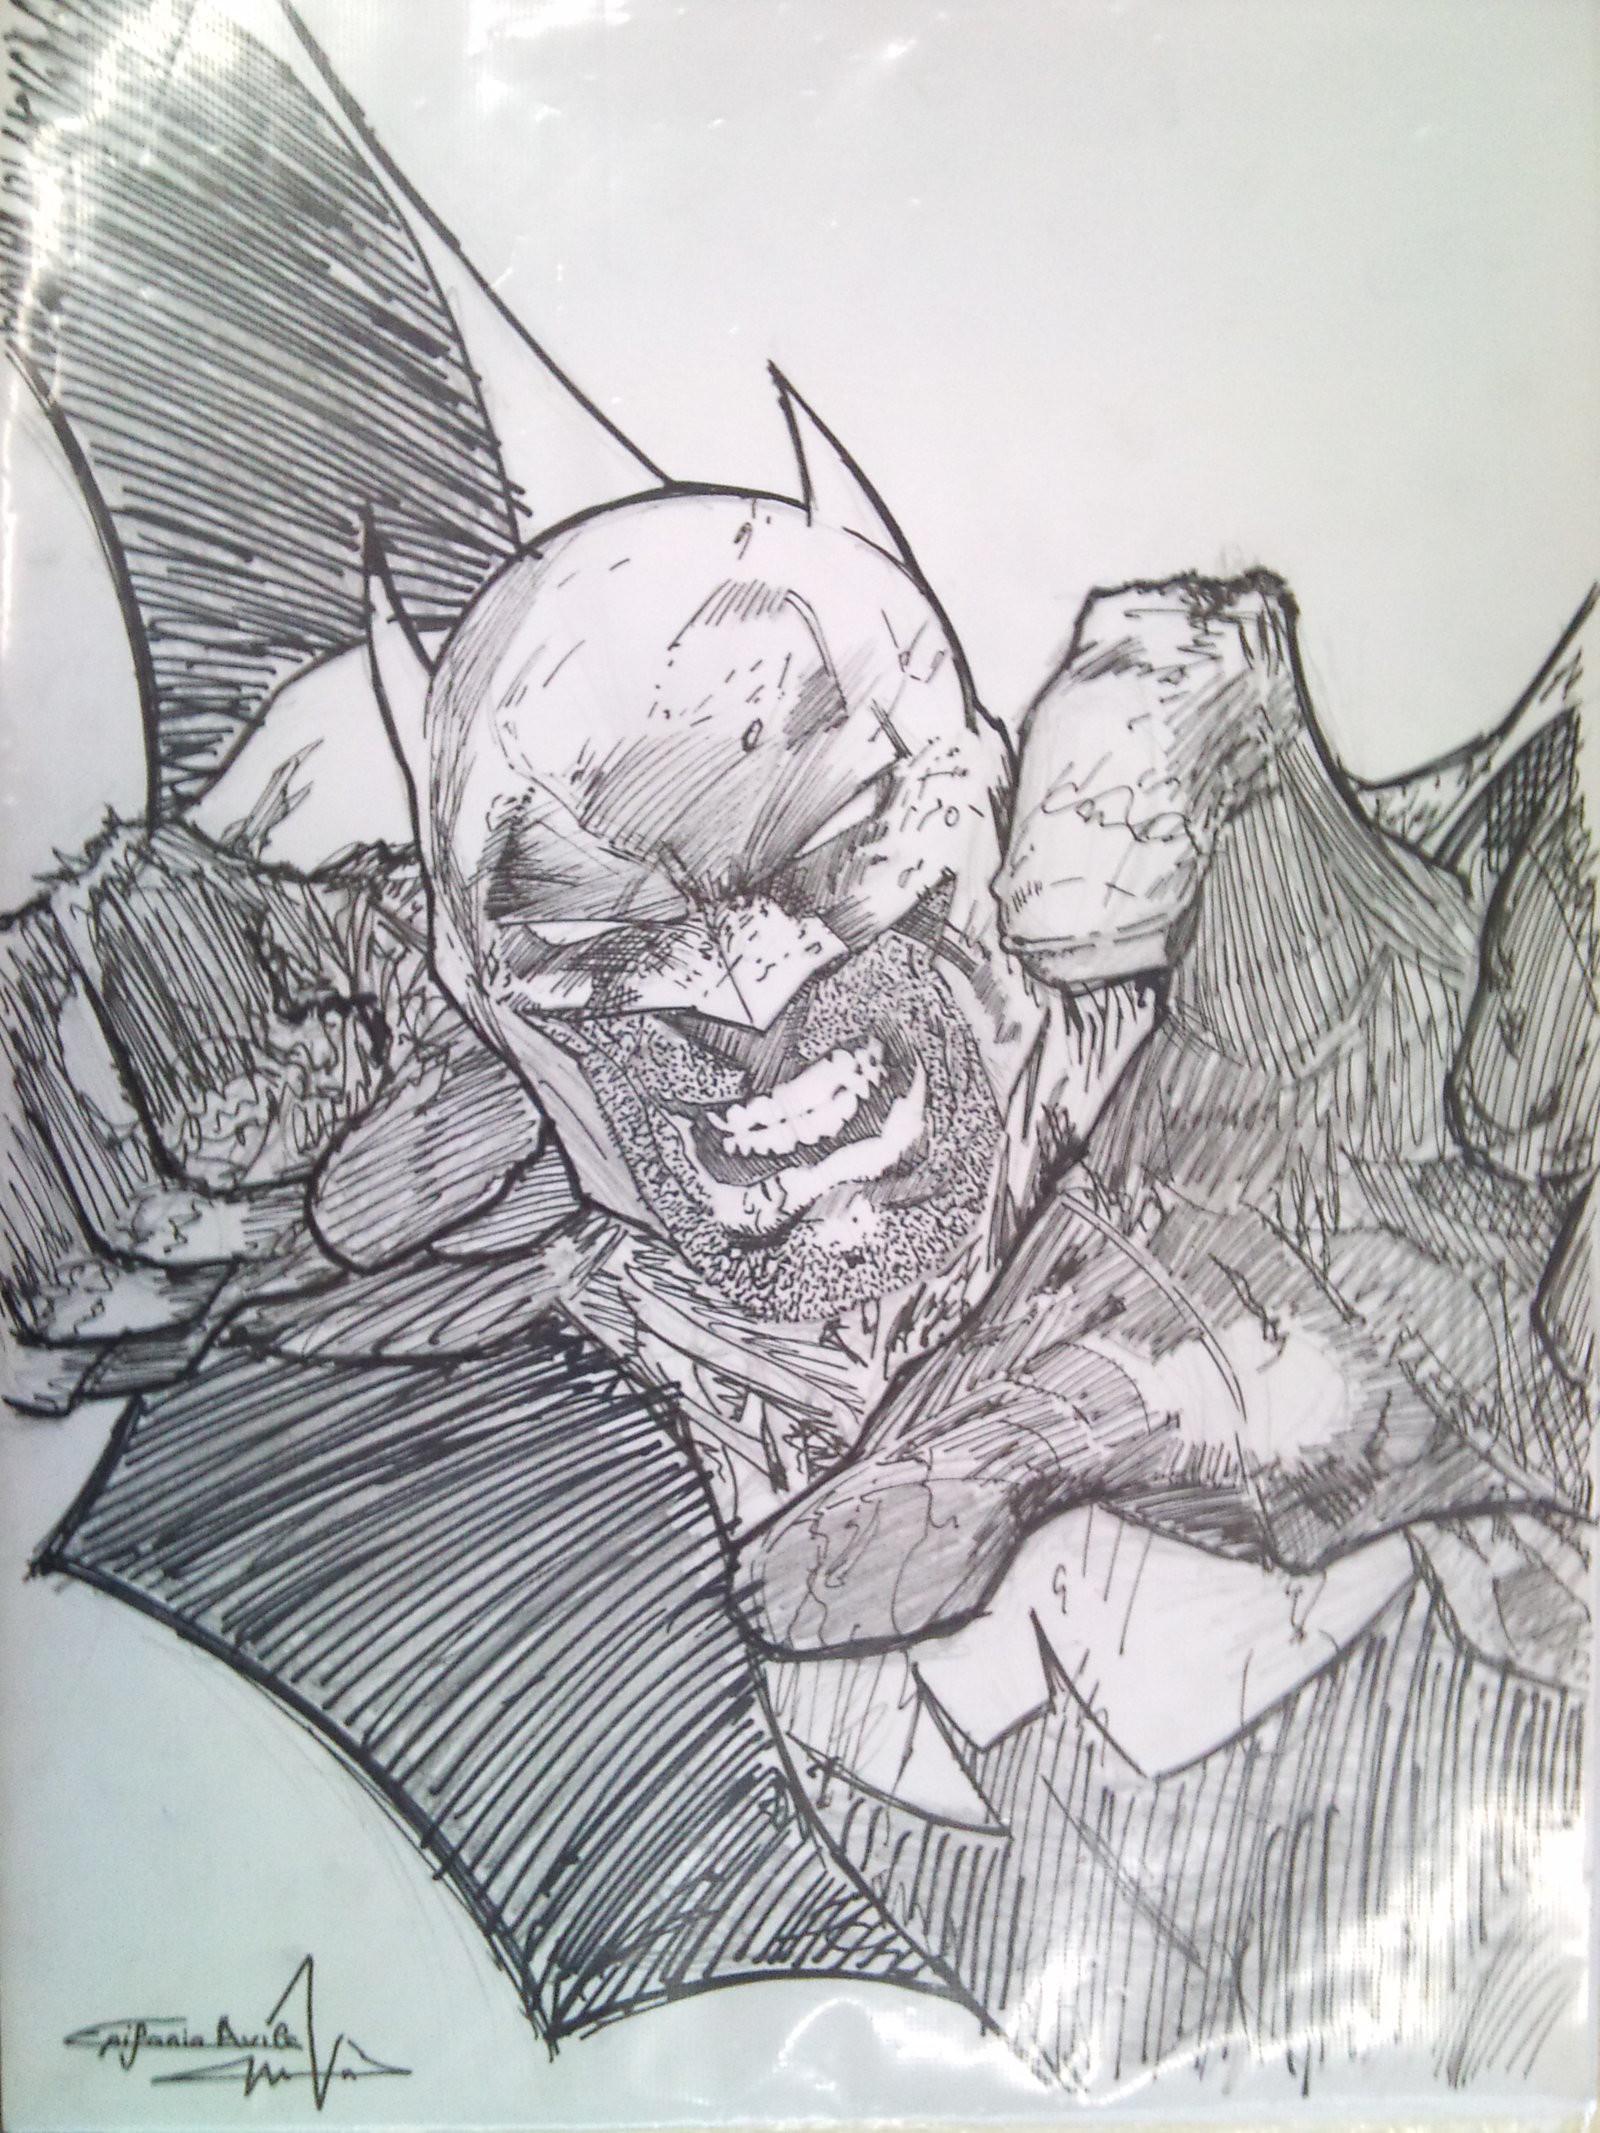 … COVER BATMAN HUSH JIM LEE by naota12